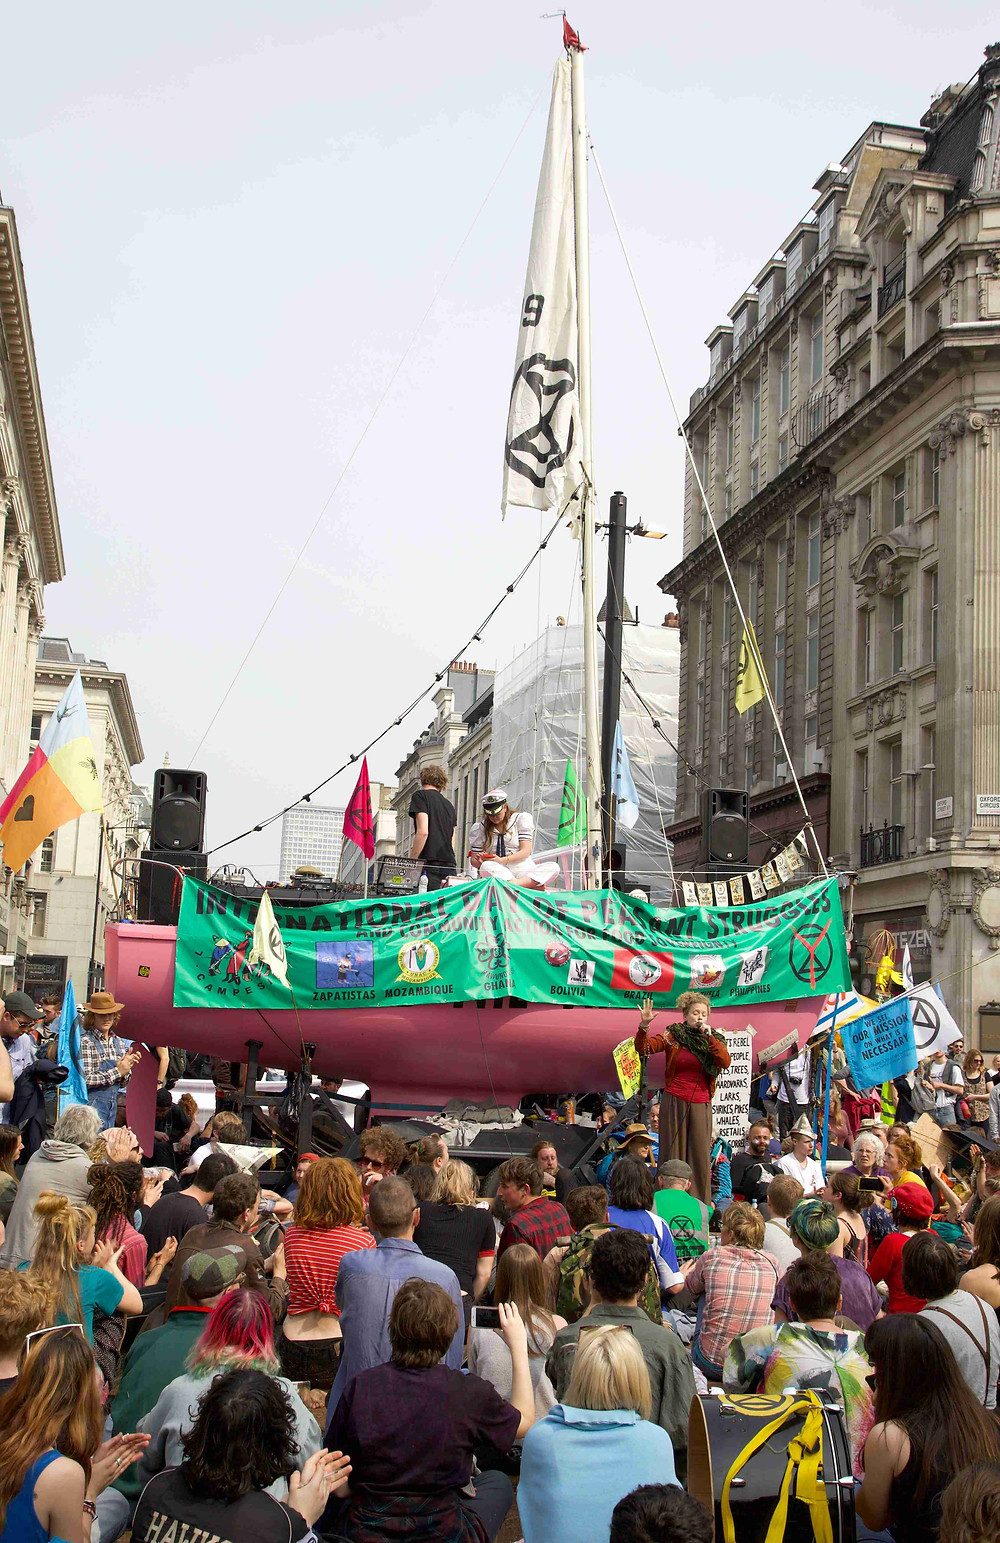 Exctinction Rebellion occupation, Oxford circus